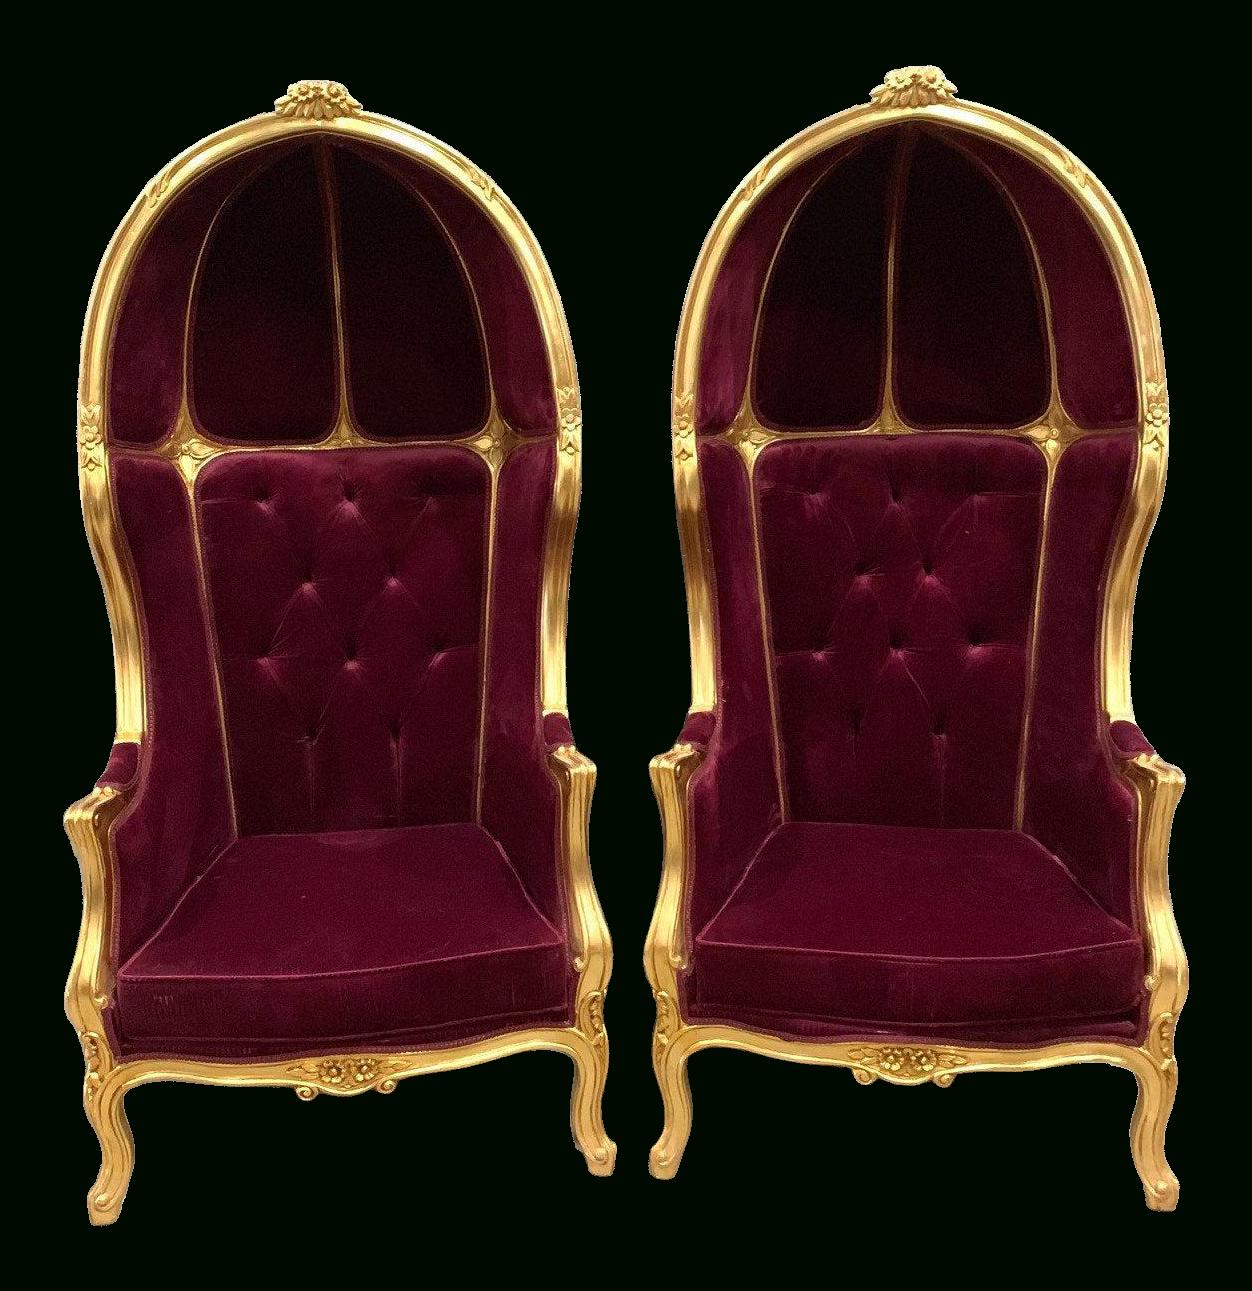 Burgundy Velvet Wingback Chair Inside Lenaghan Wingback Chairs (View 15 of 15)